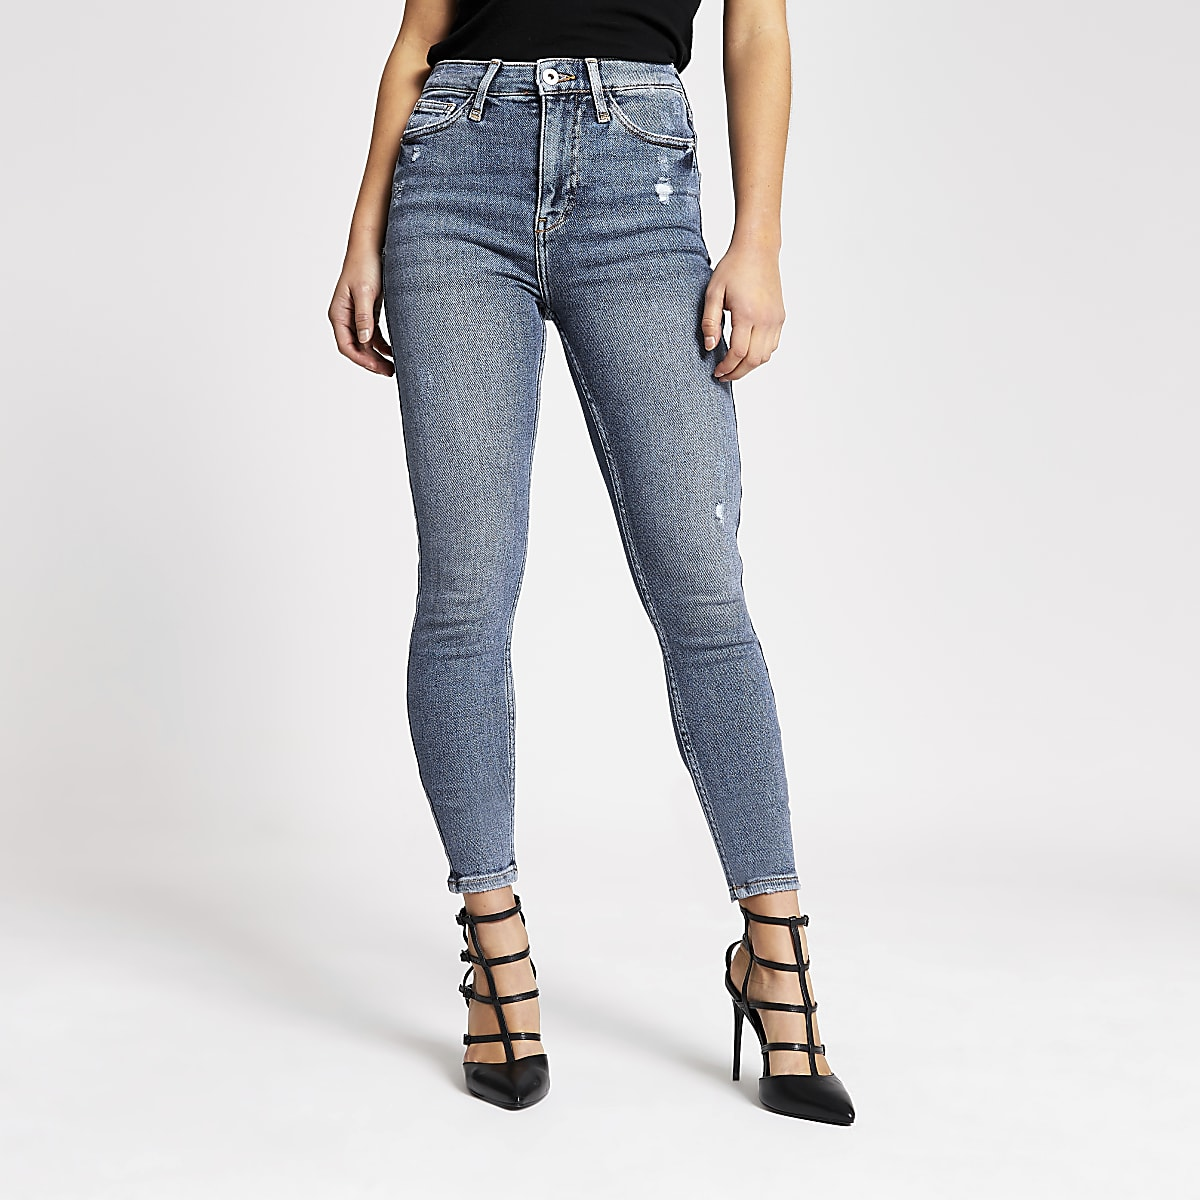 Petite – Hailey – Jean bleu taille haute